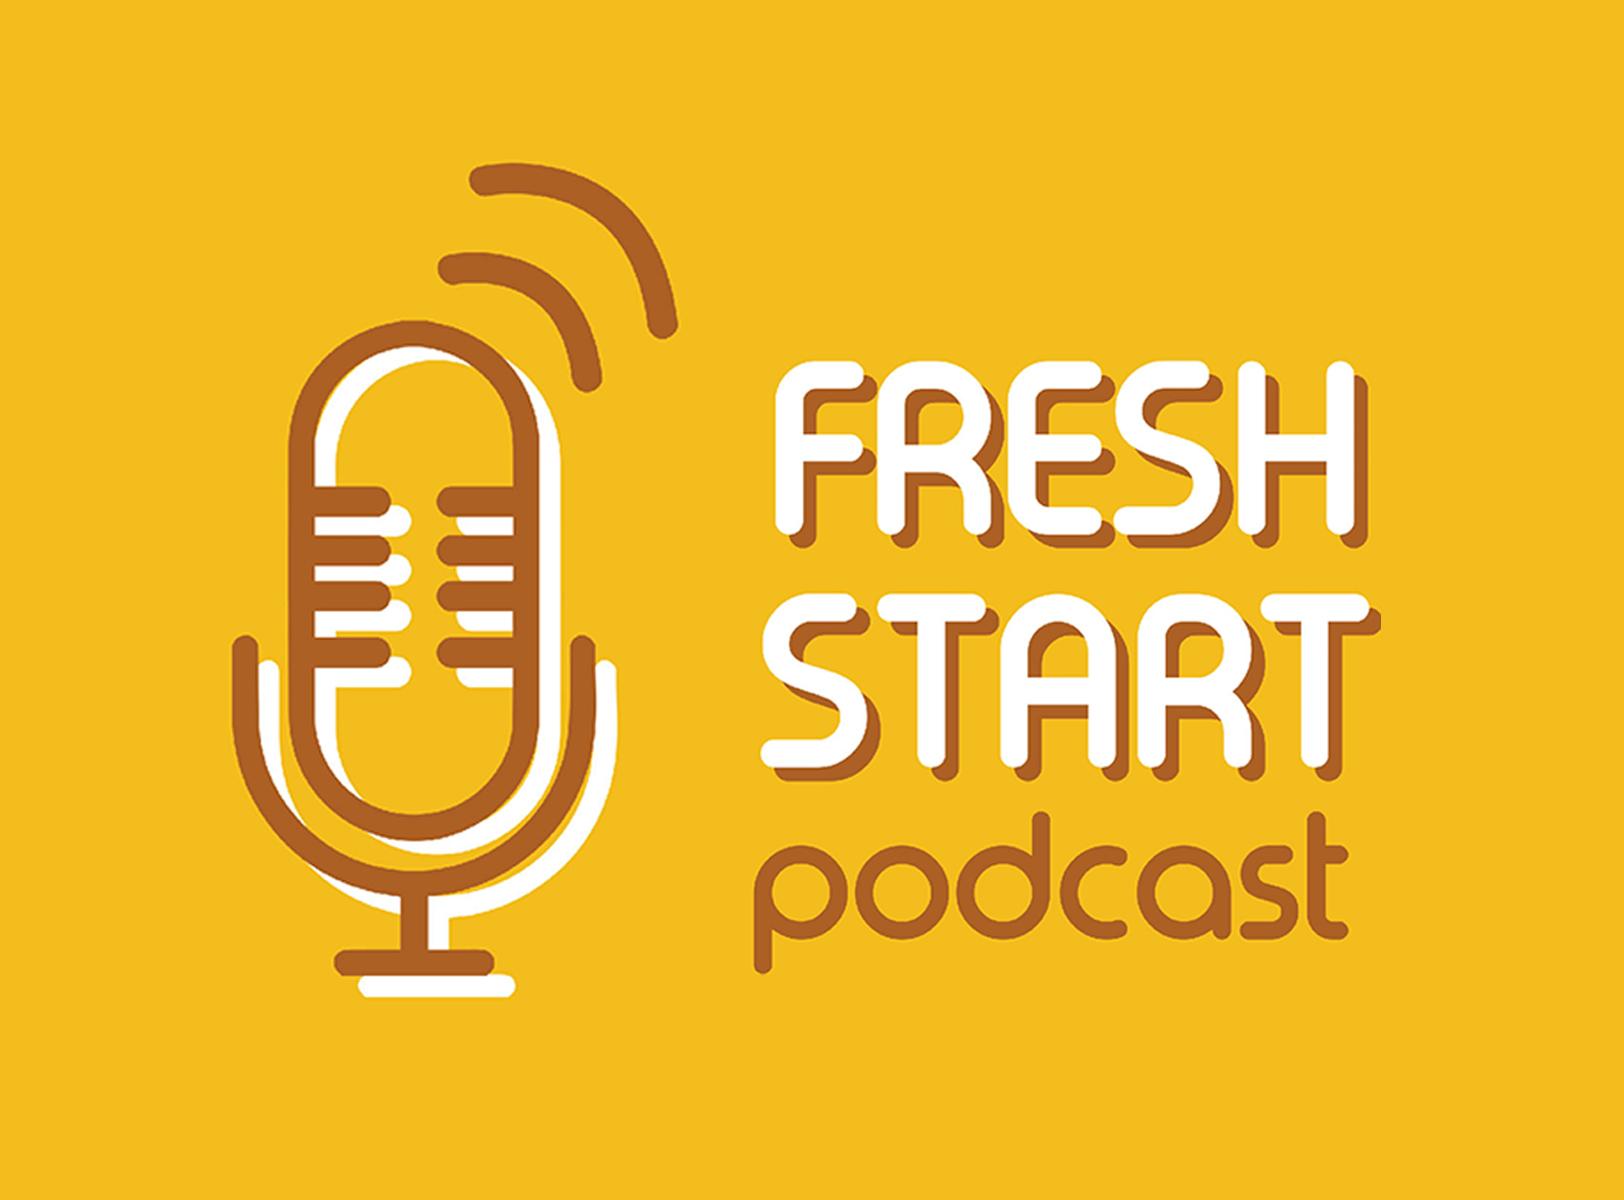 Fresh Start: Podcast News (10/15/2019 Tue.)